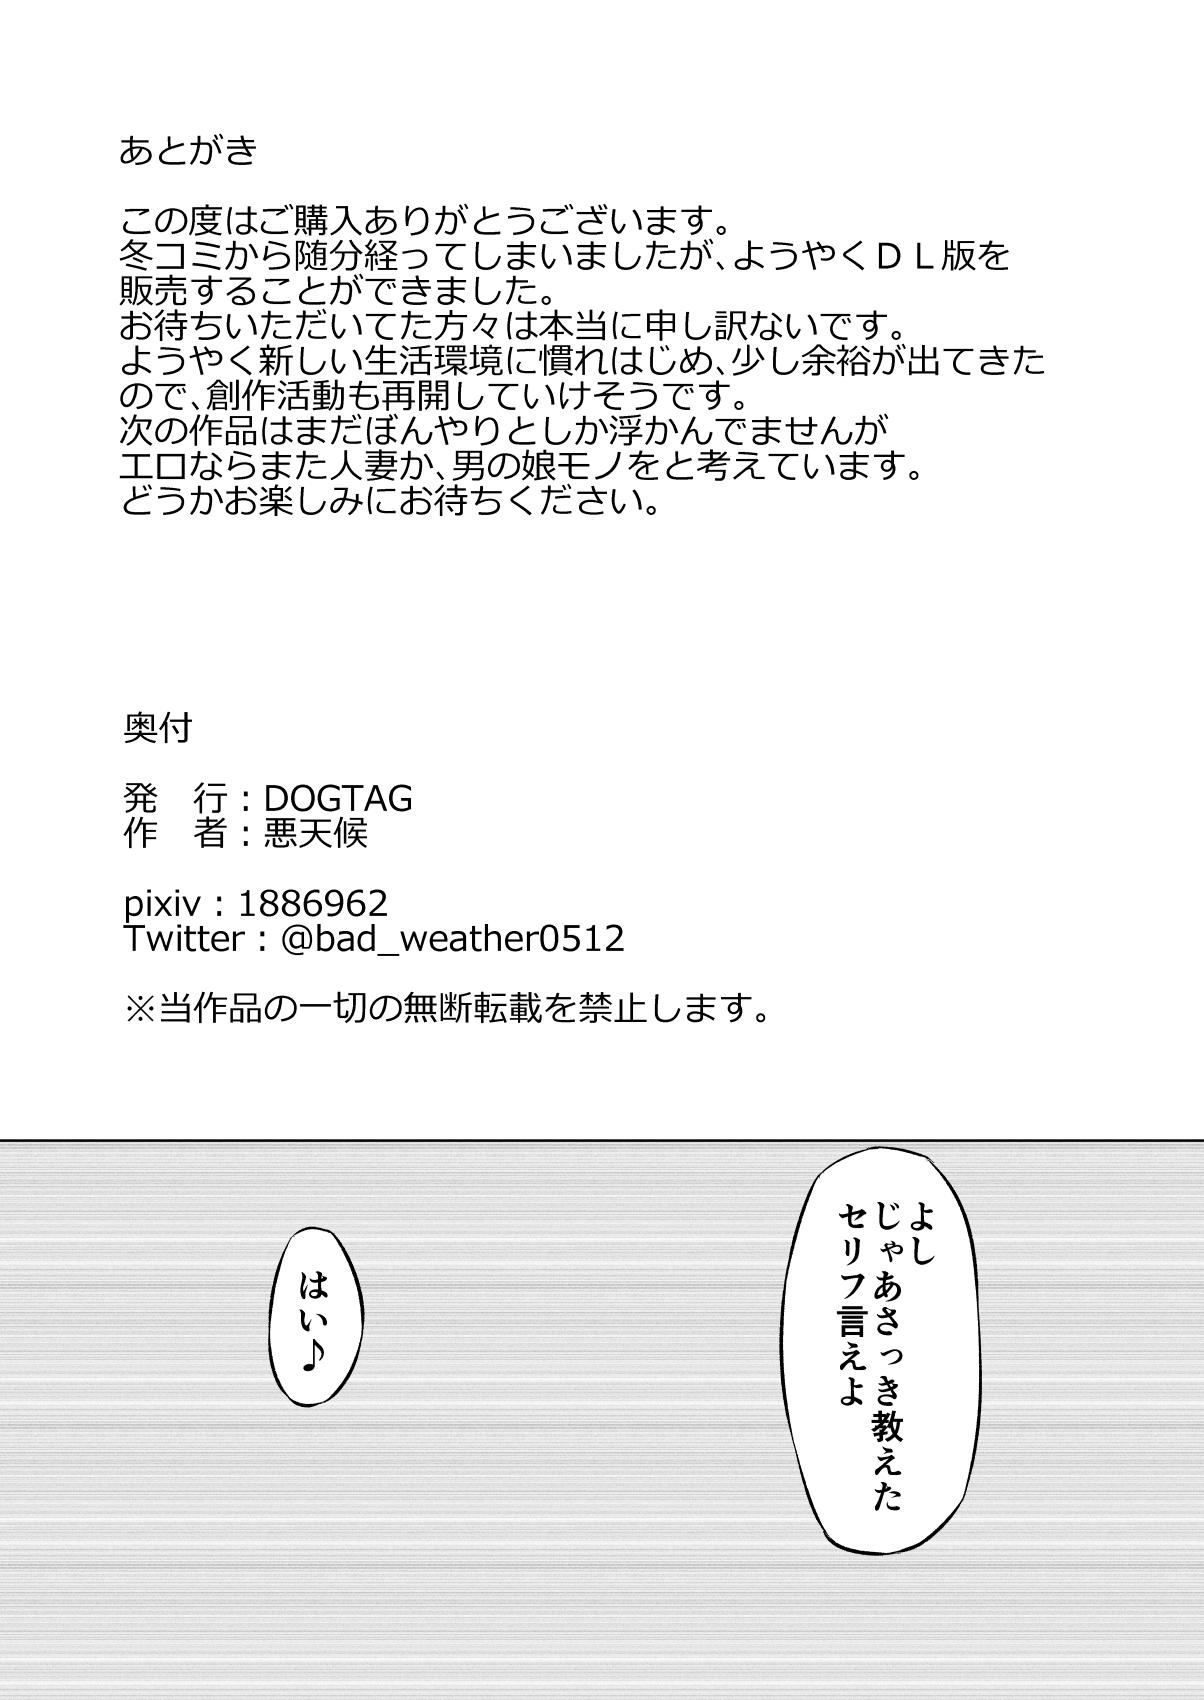 Hitozuma ga Off-kai de Omochikaerare Hon 20